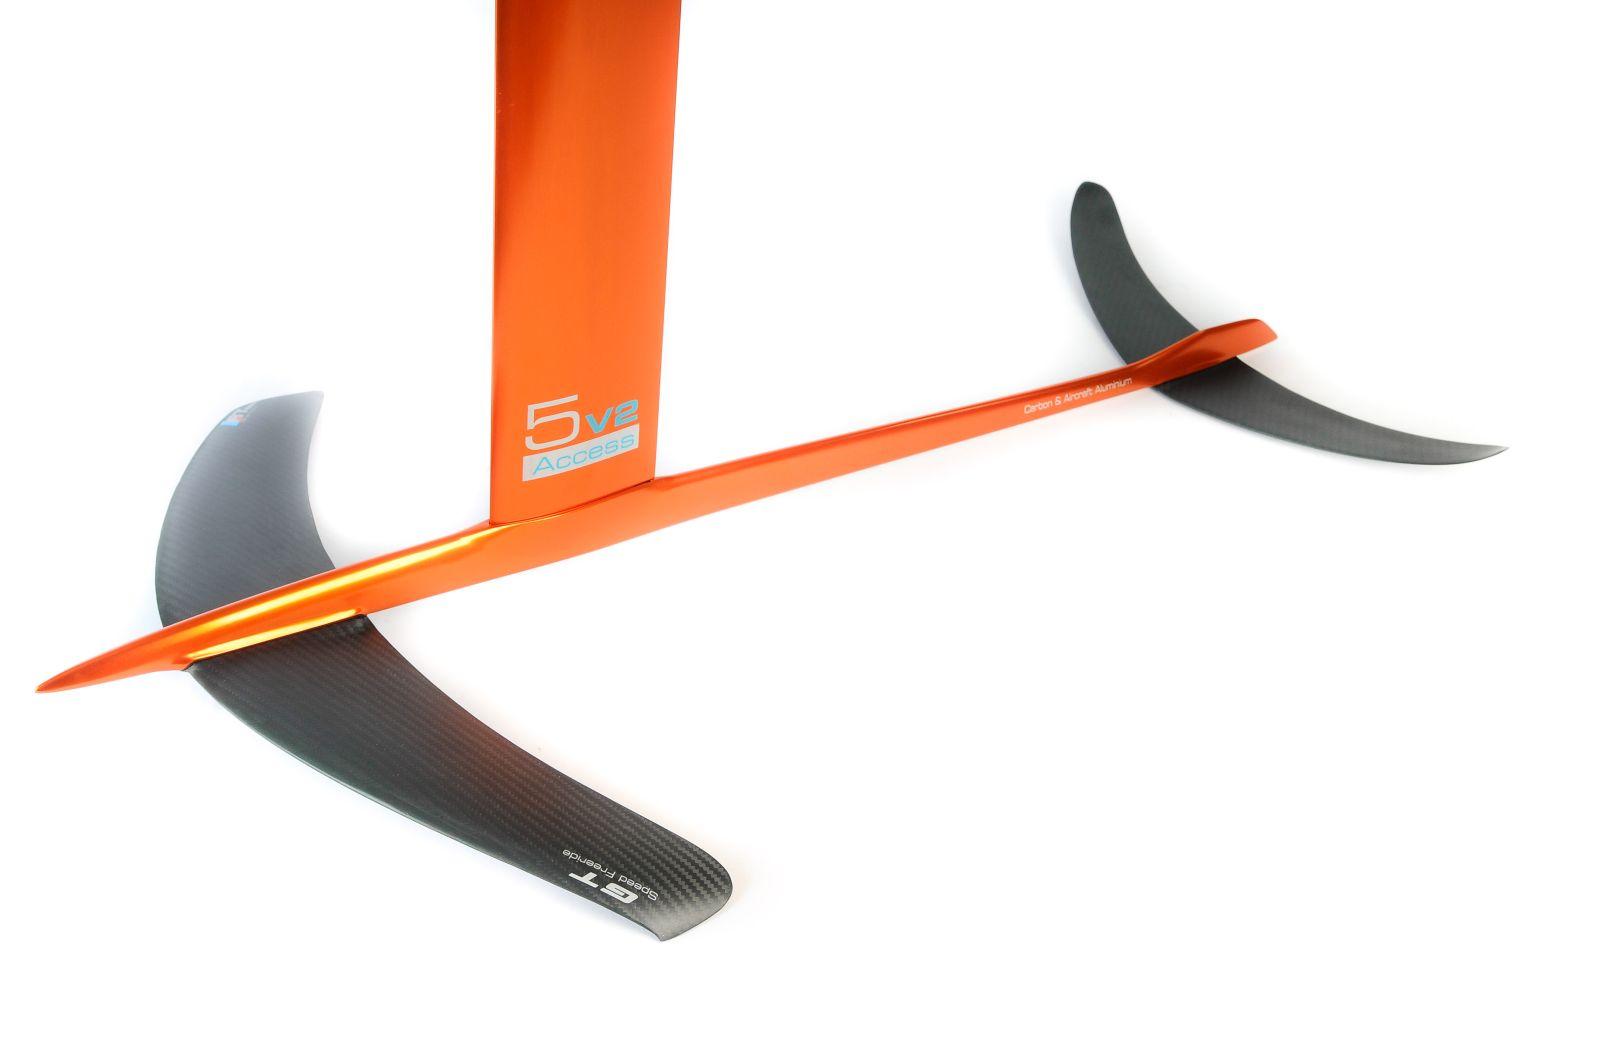 Kitefoil carbon aluminium alpinefoil 5 0 access v2 2602 1